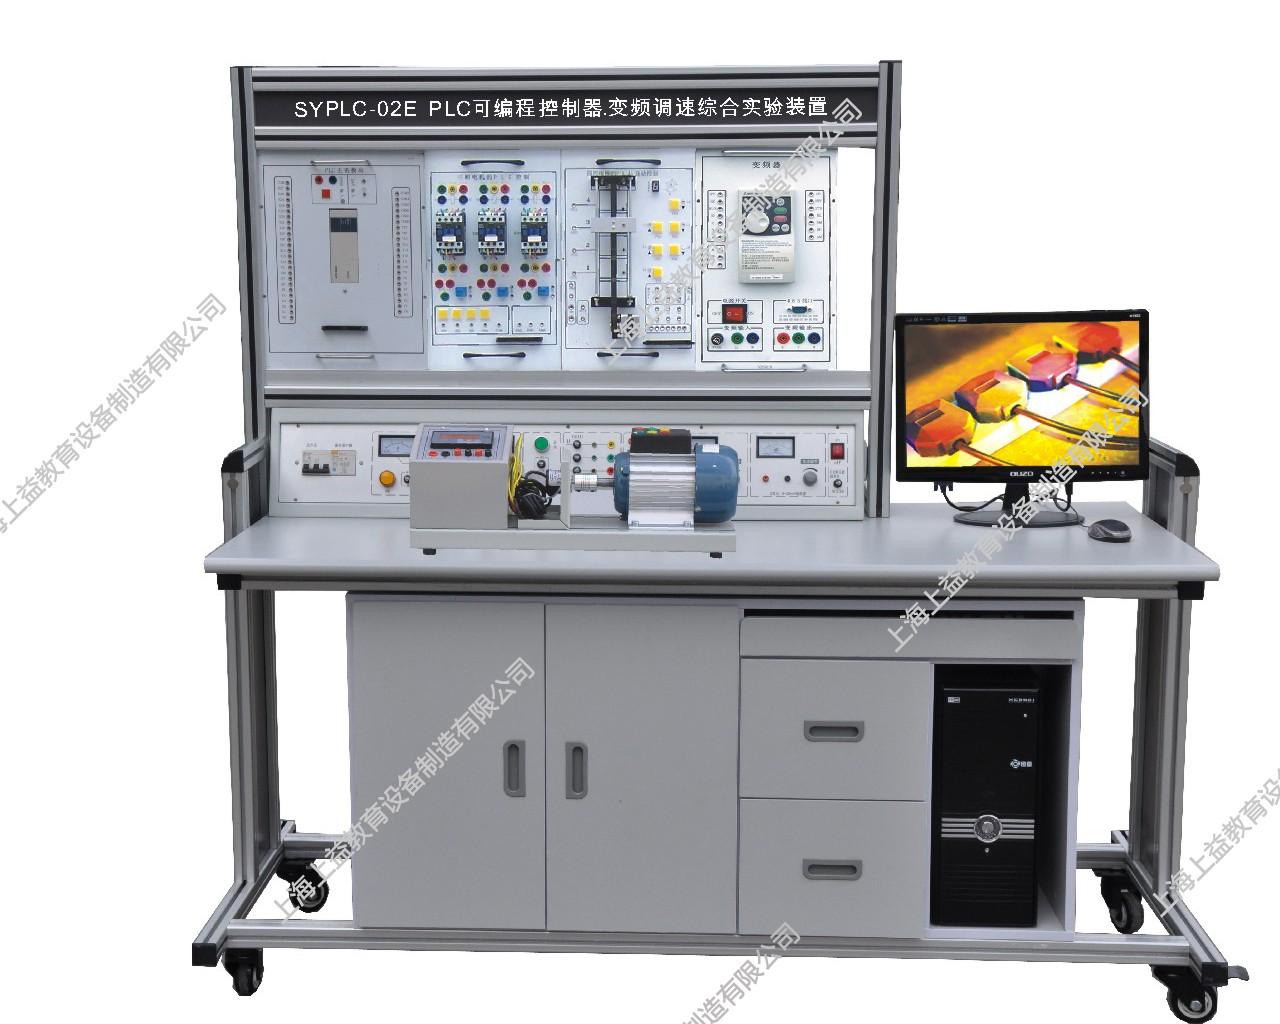 SYPLX-02BPLC可编程控制器、单片机开发应用及变频调速综合wwwlehu8vip装置